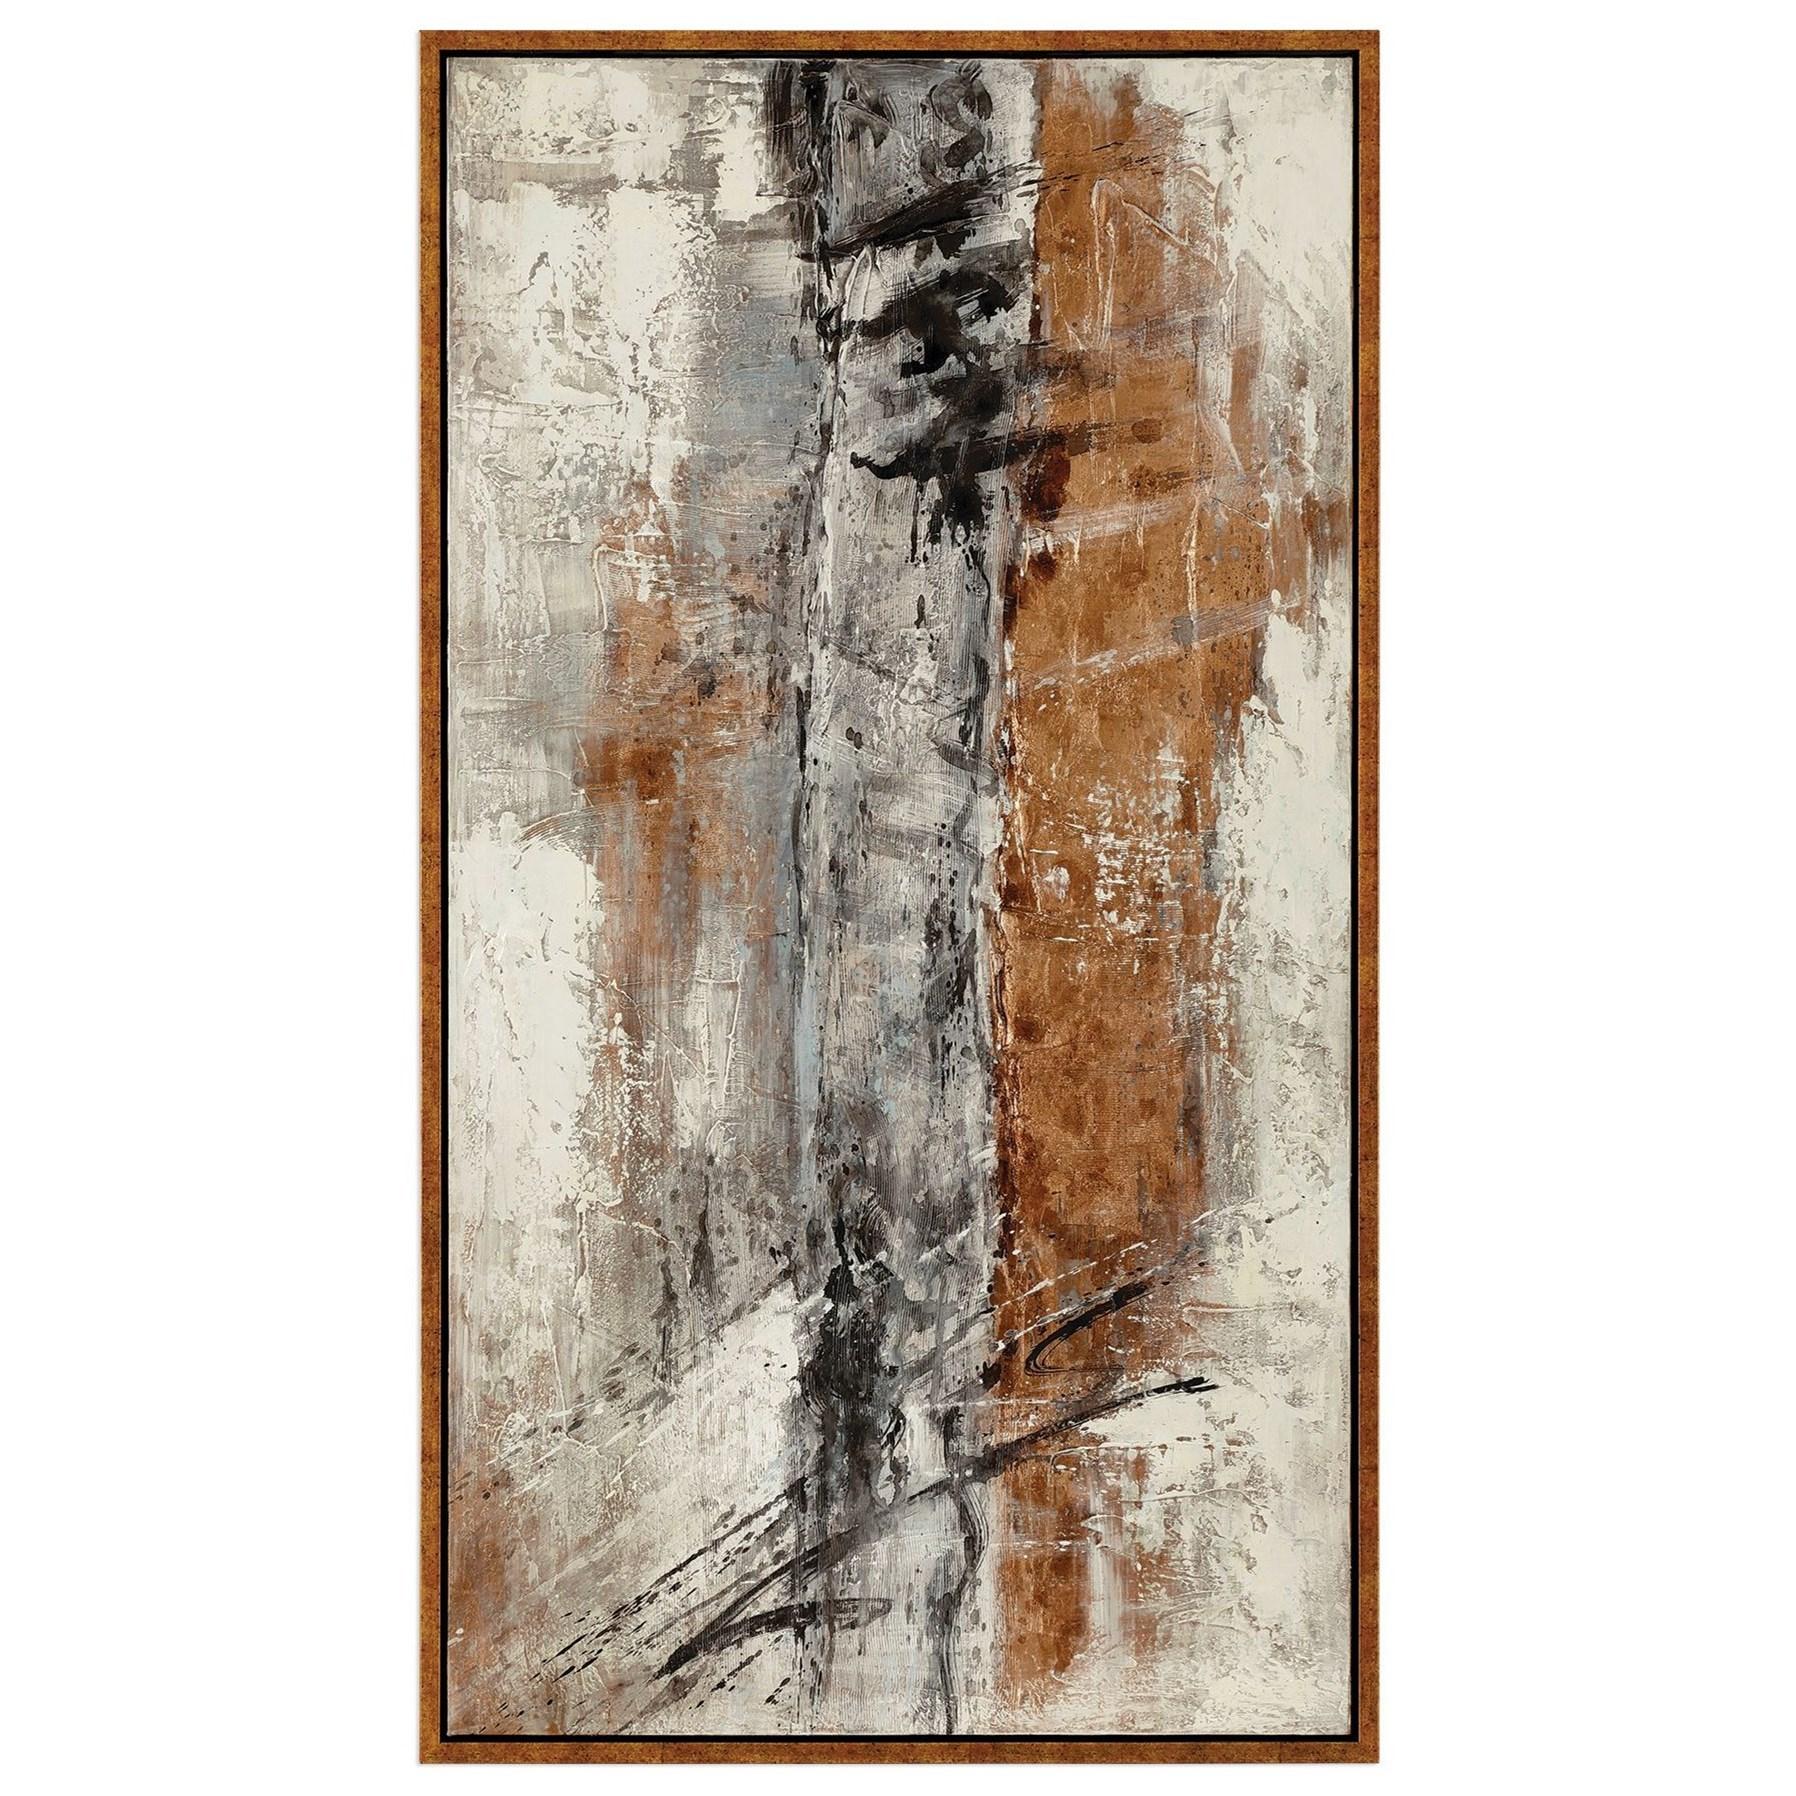 Art Spice Of Life Modern Art by Uttermost at Mueller Furniture